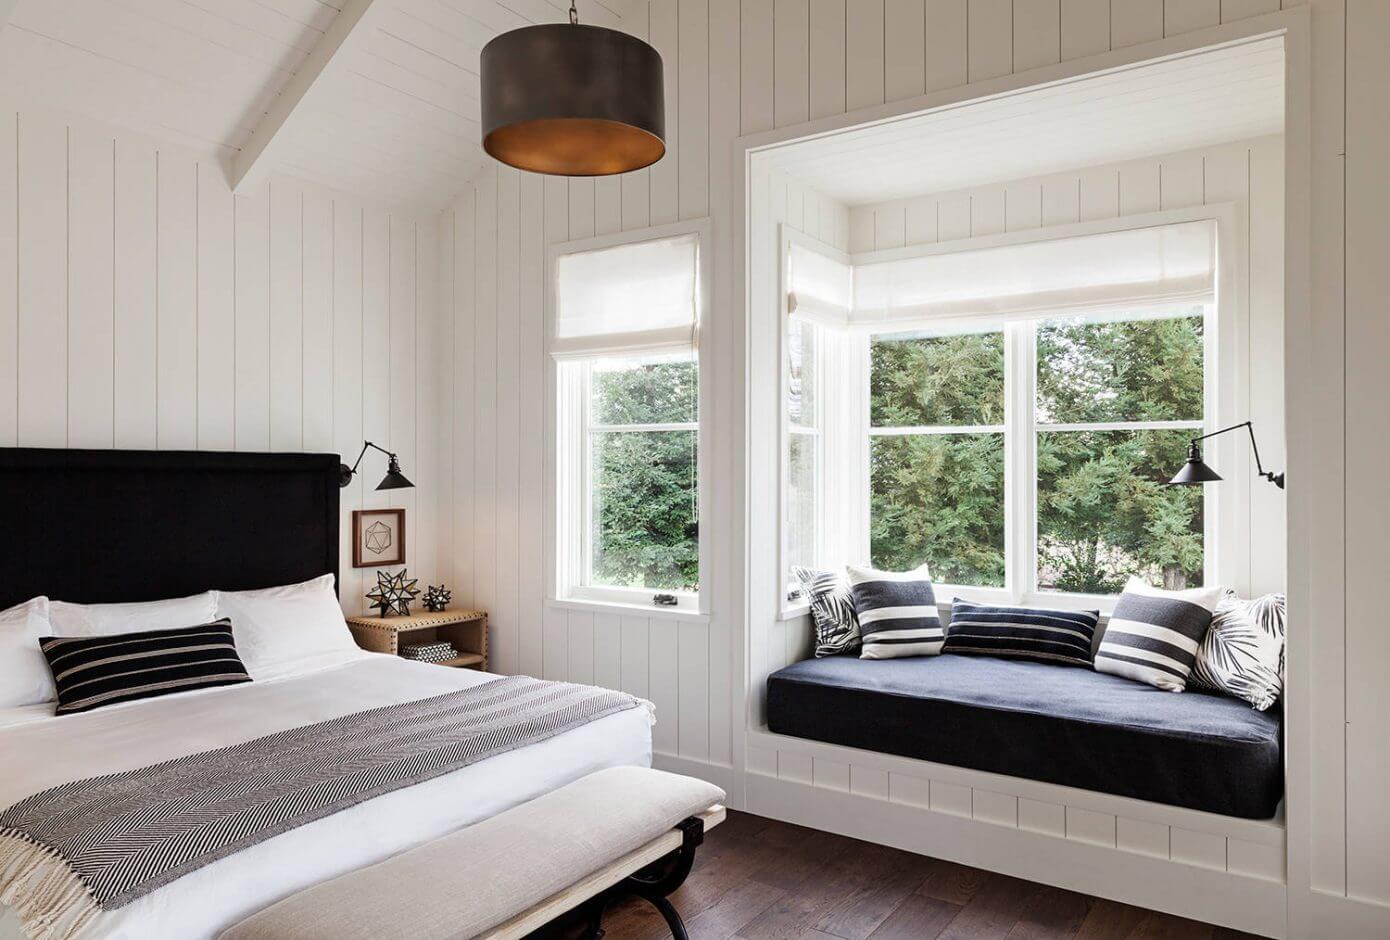 Healdsburg House by Dotter & Solfjeld Architecture + Design